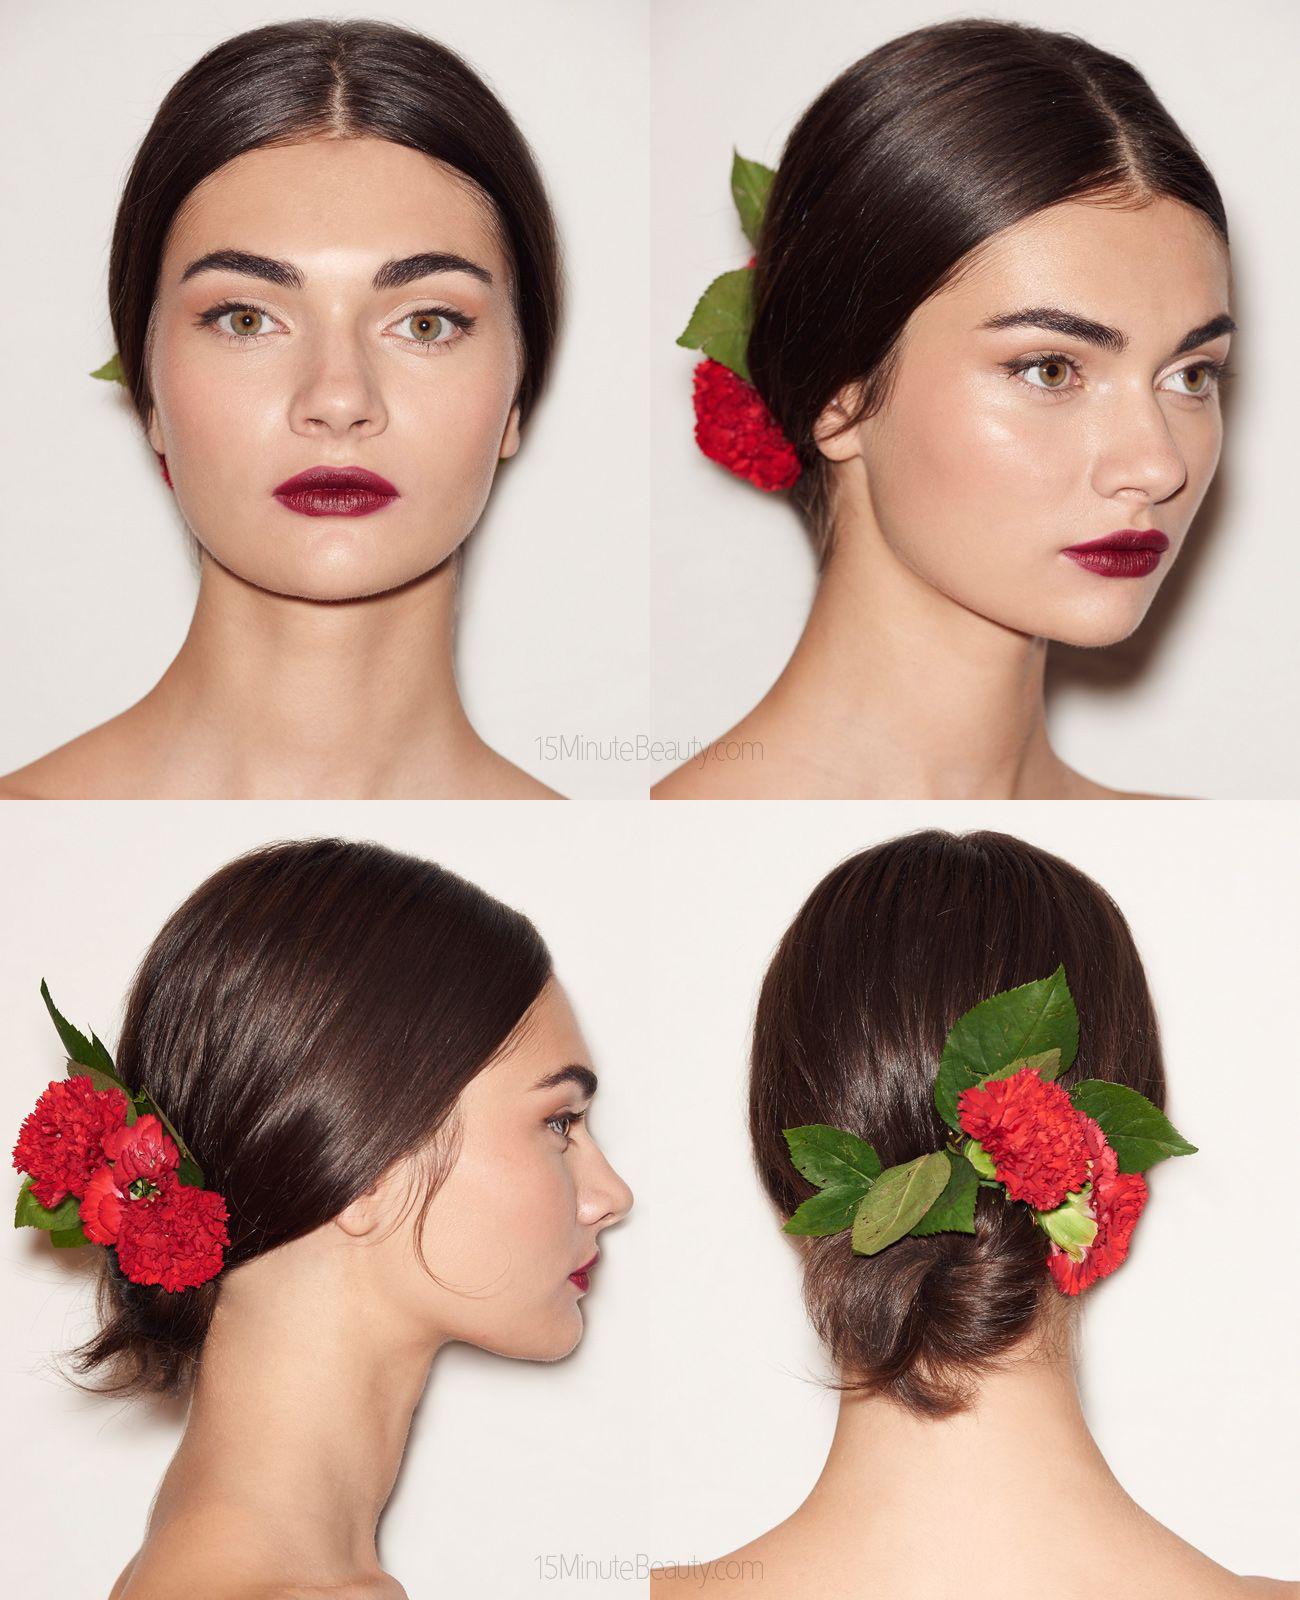 get the look | spring-summer beauty 2015 | hair makeup